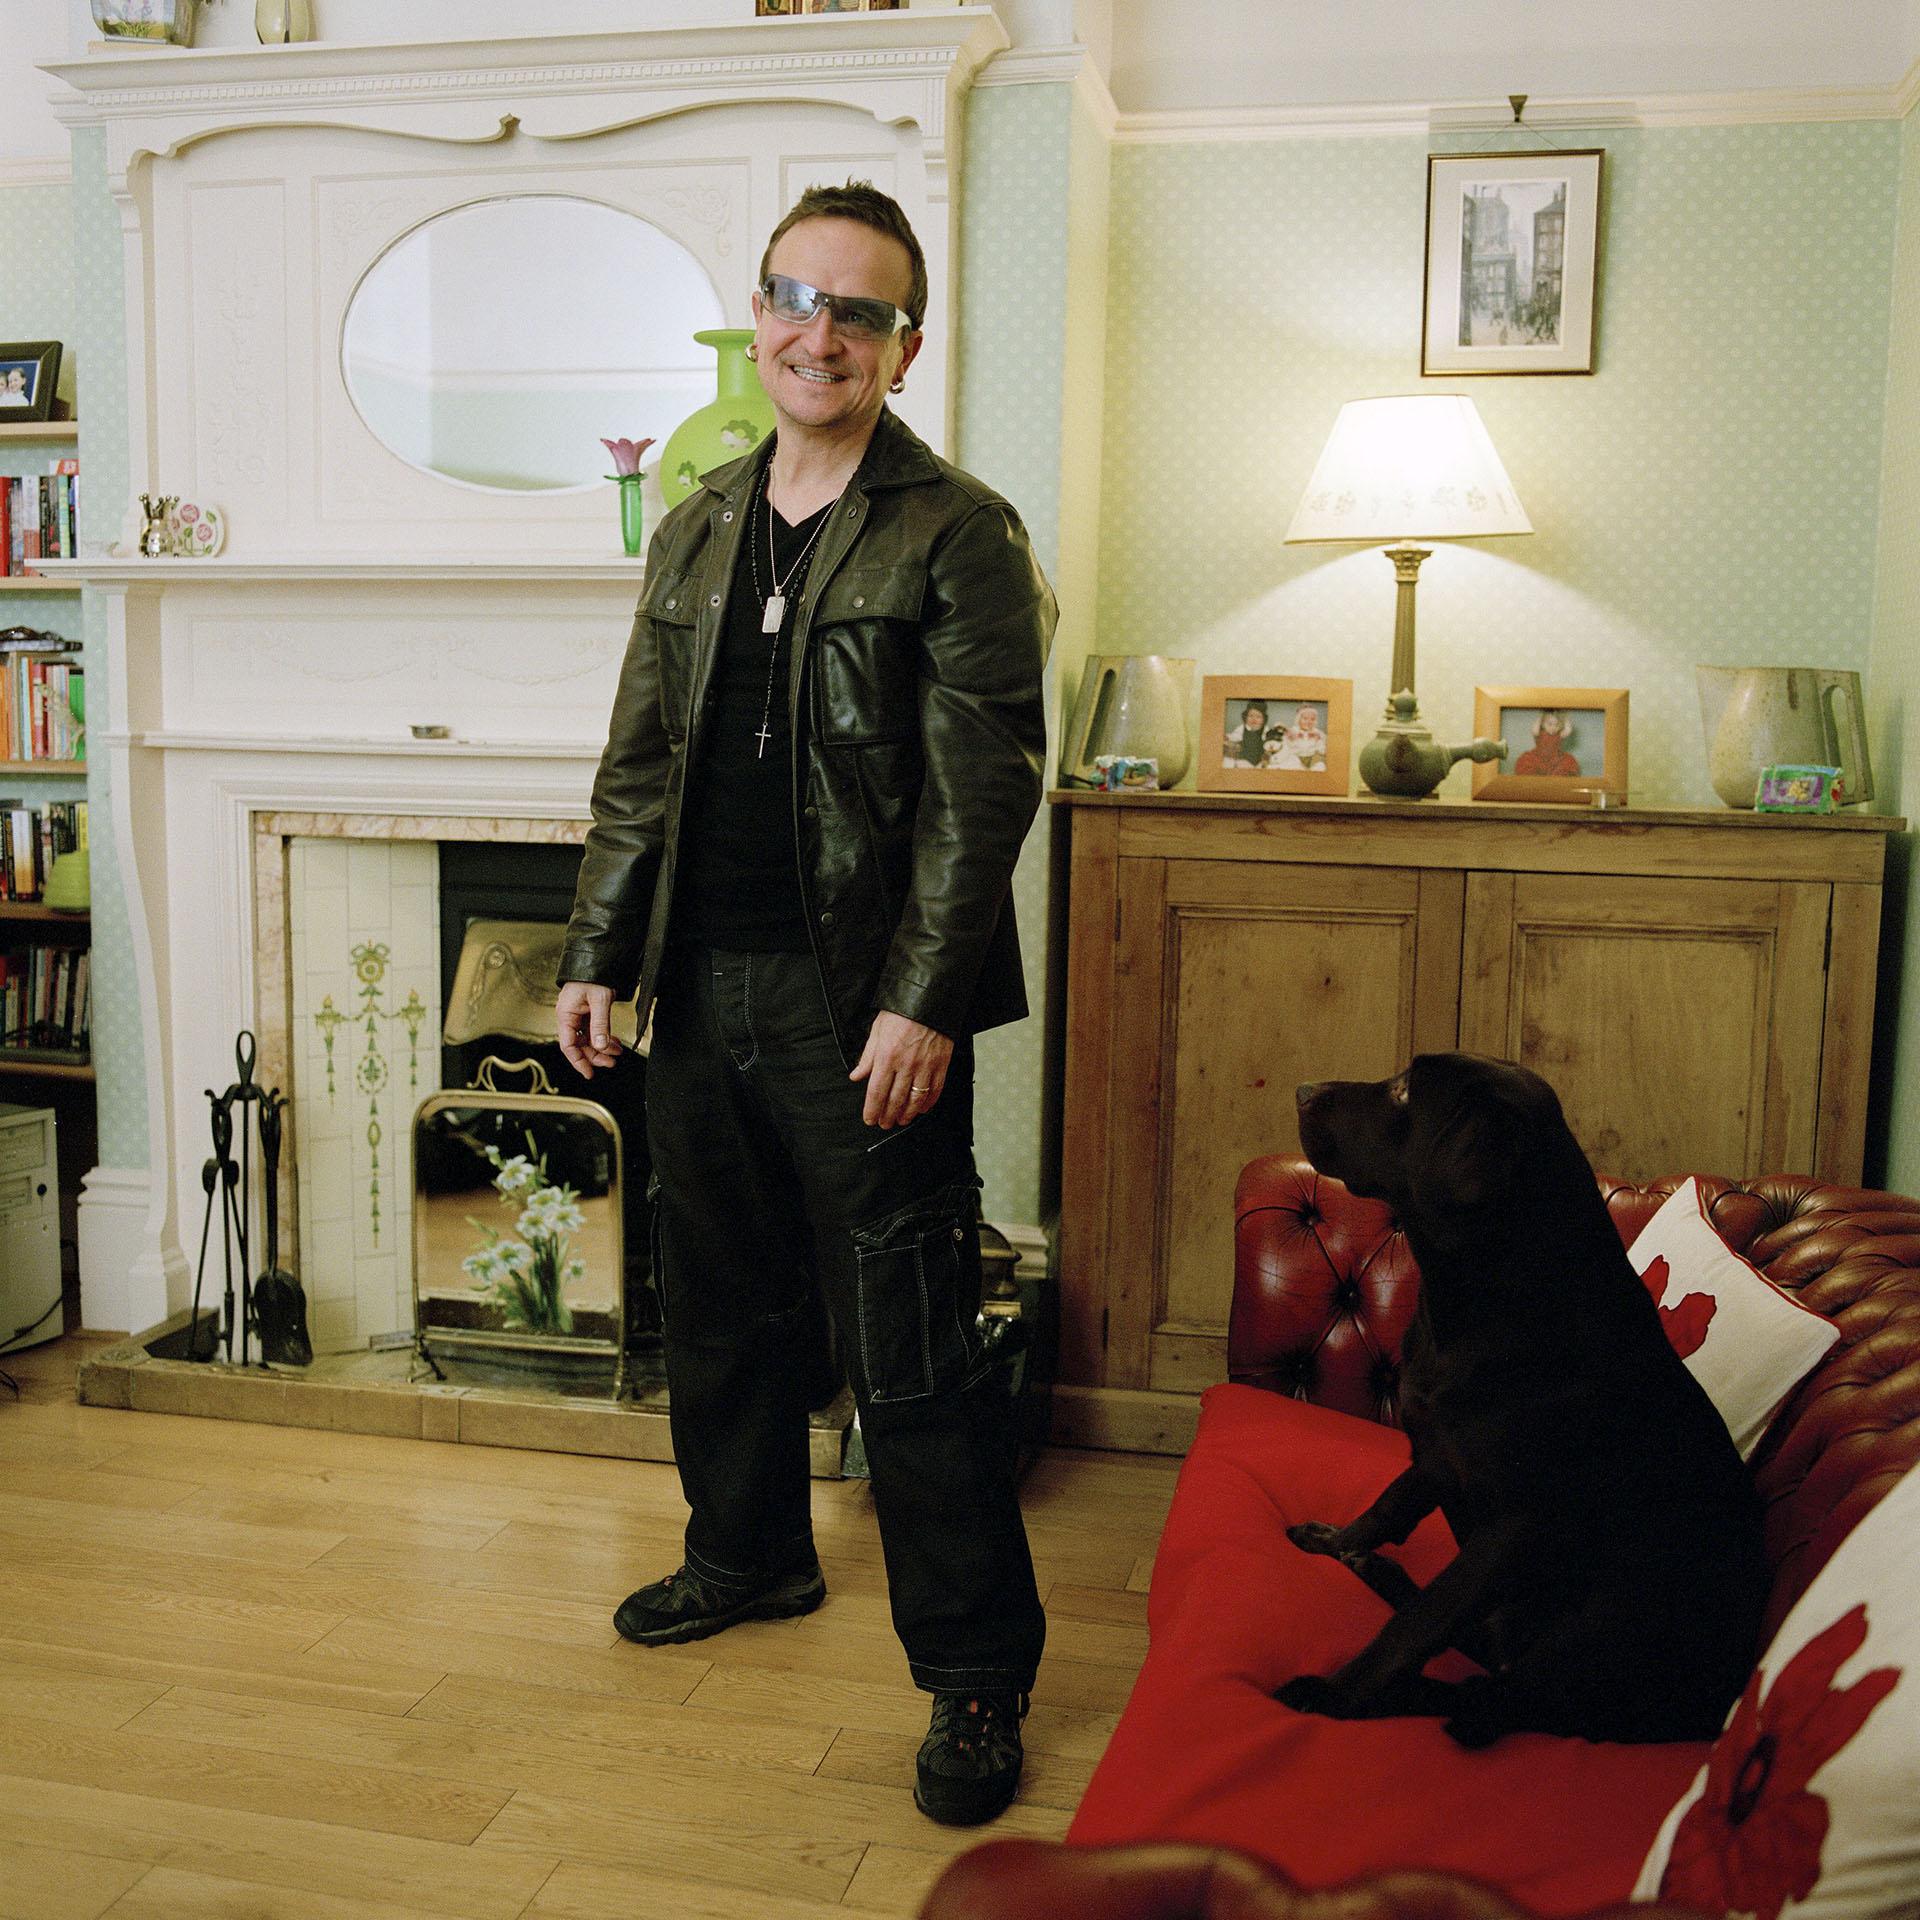 Andy Barker alias Bono